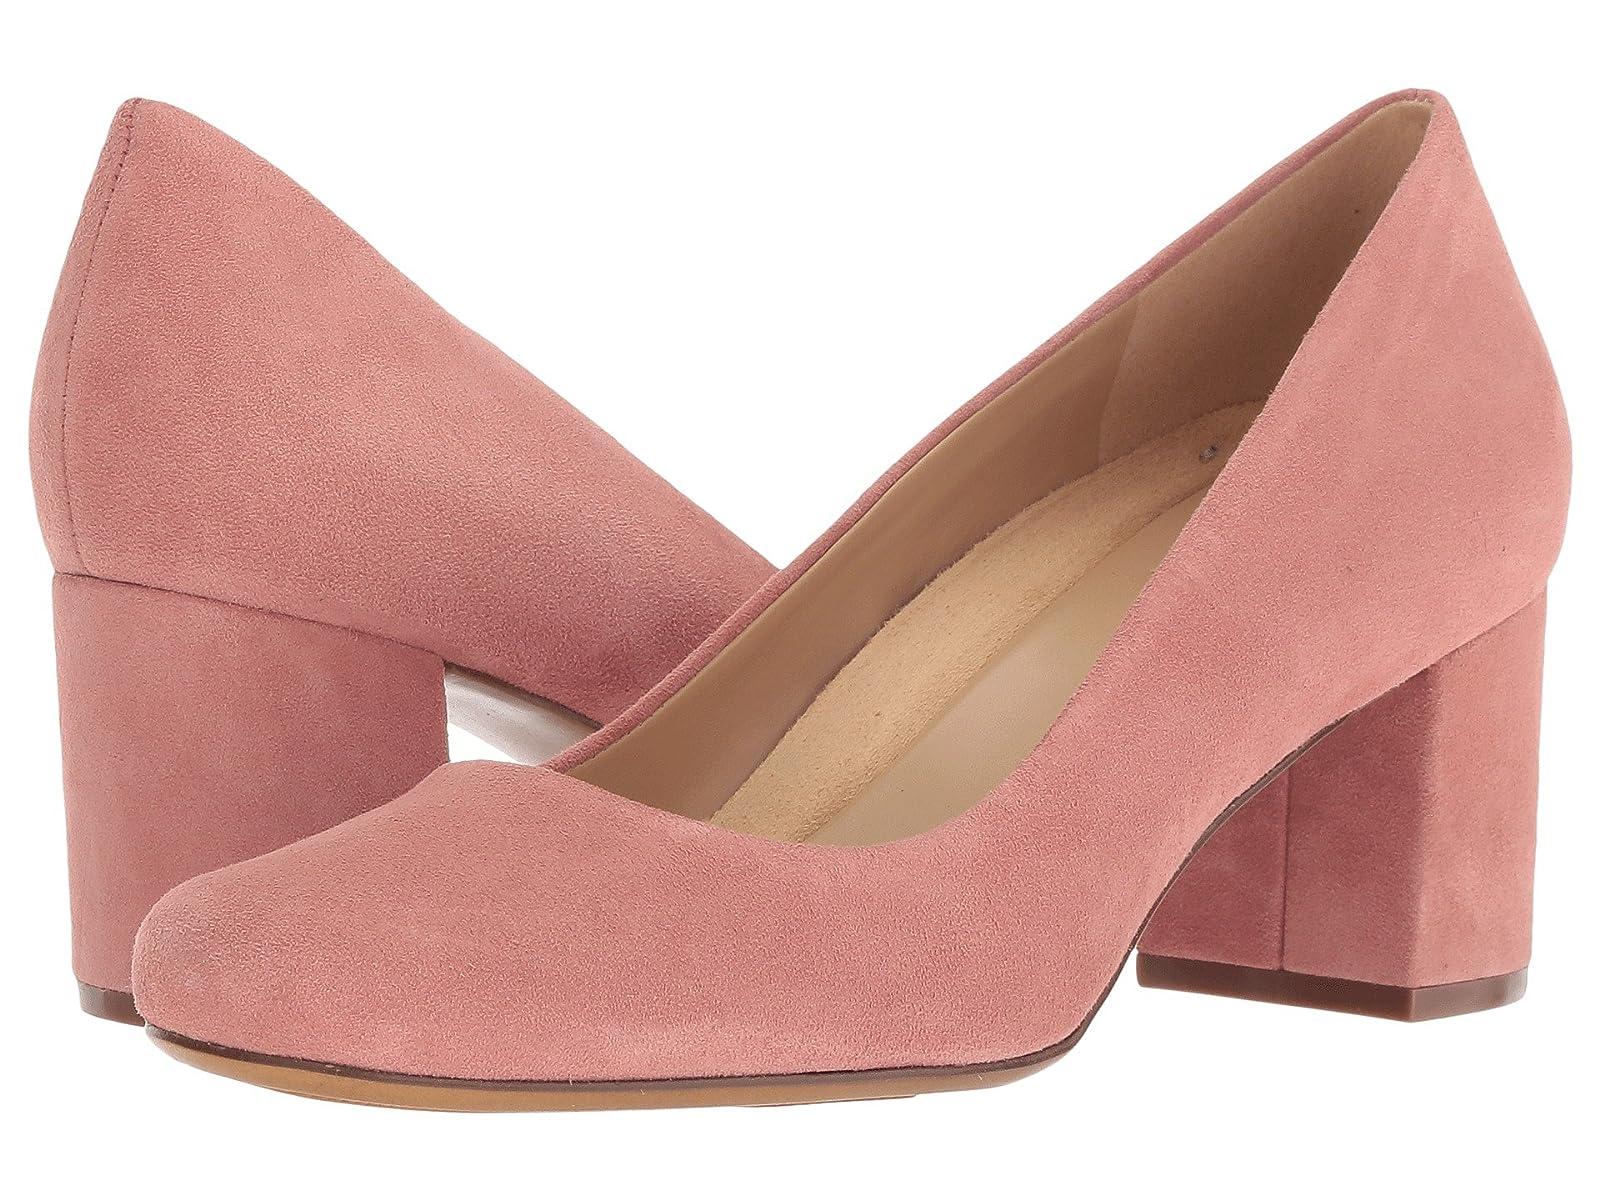 Naturalizer WhitneyAtmospheric grades have affordable shoes